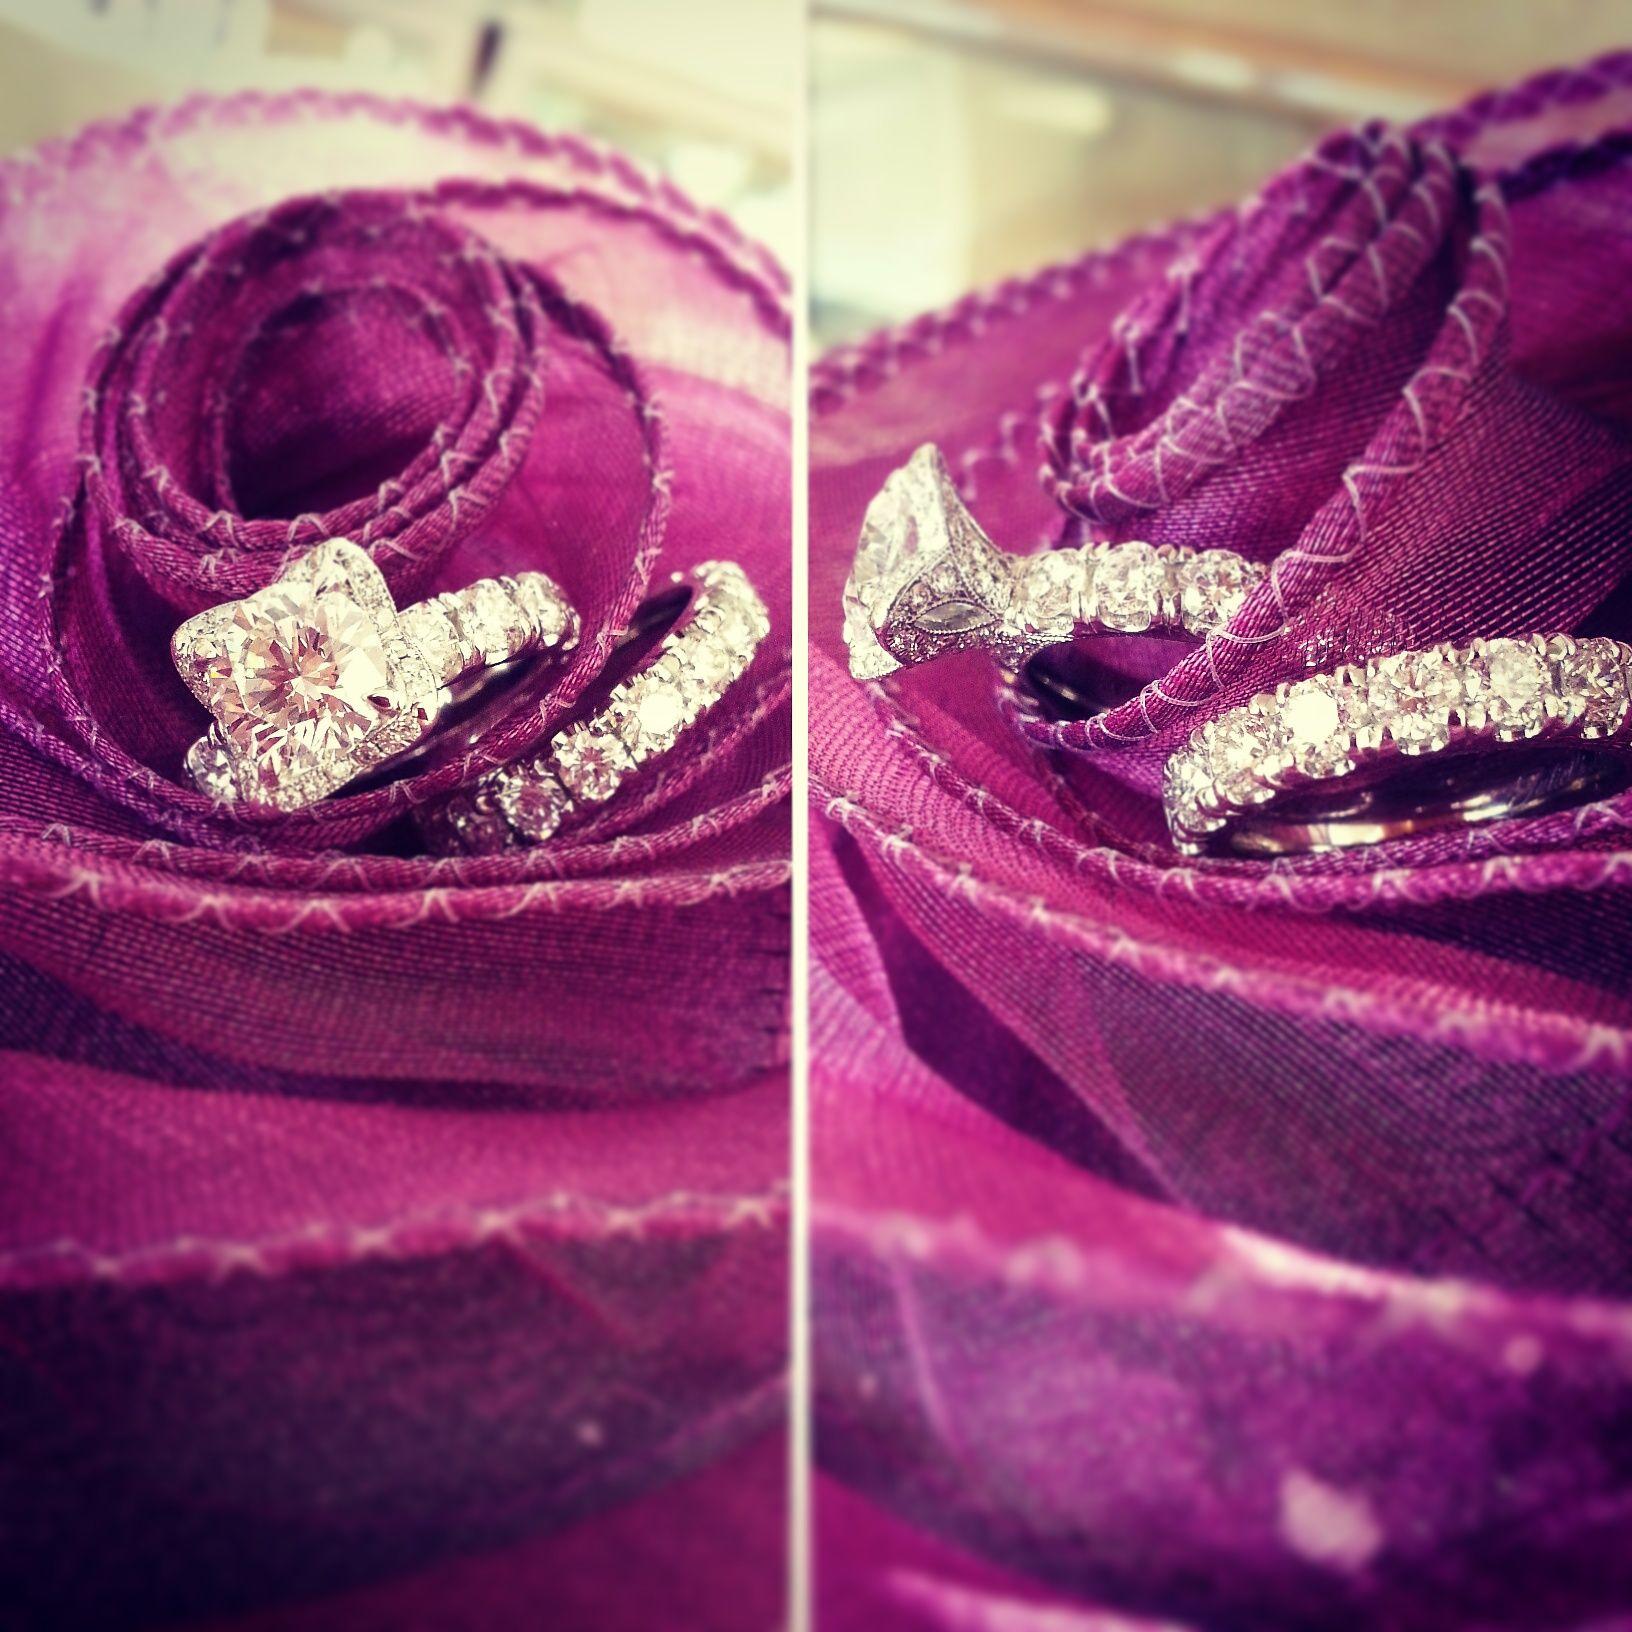 Bridal set by Katharine James, available at Calvin's in Austin. #diamond #platinum #engagementring #halo